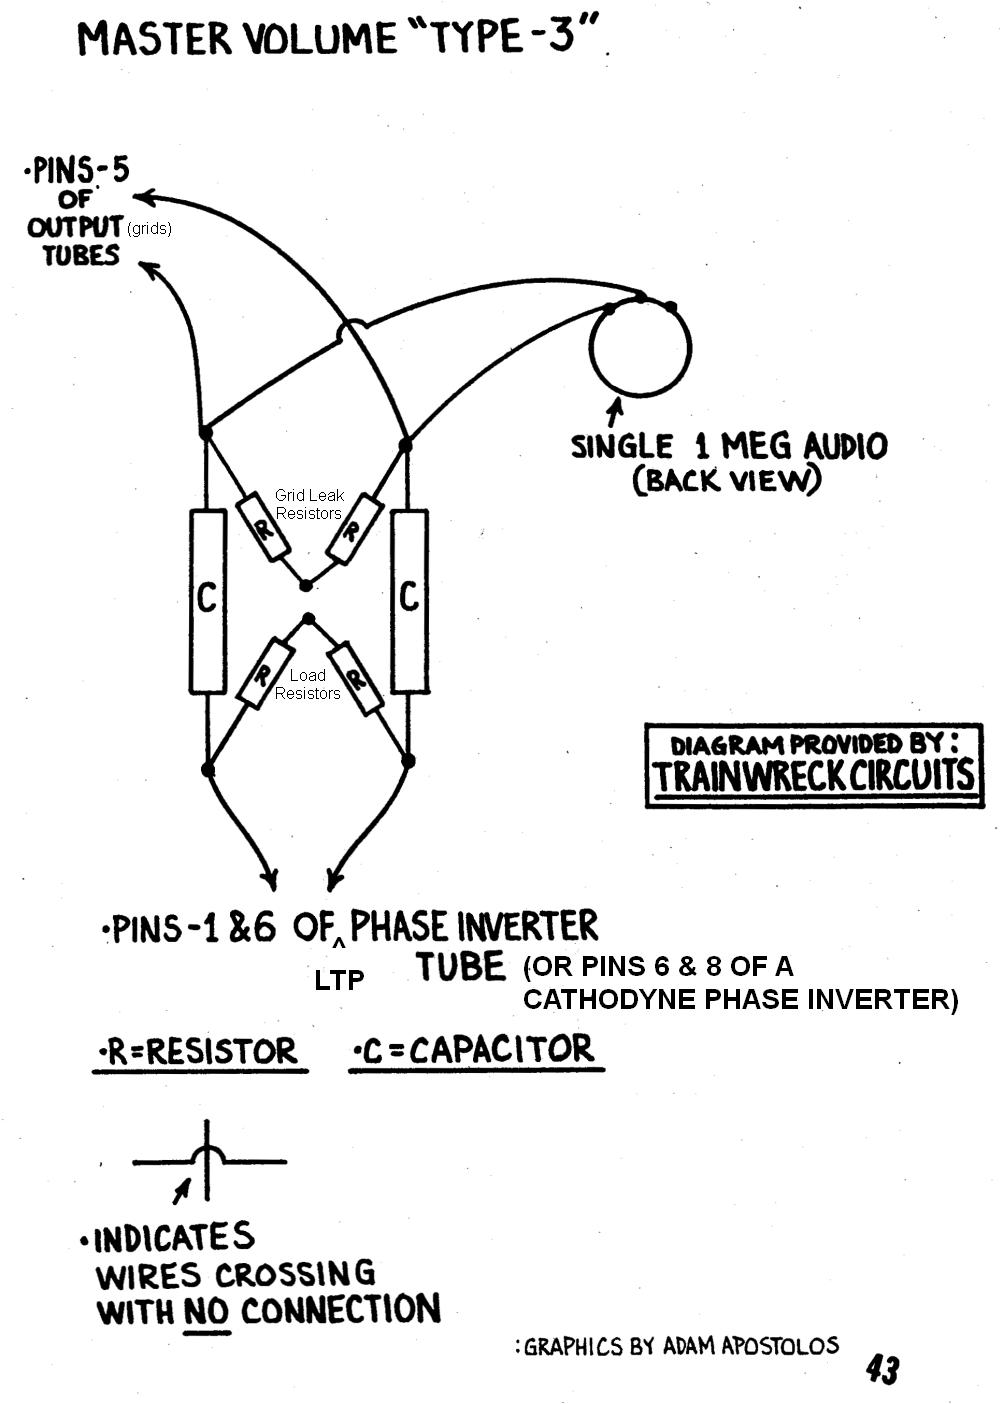 medium resolution of type 3 master volume